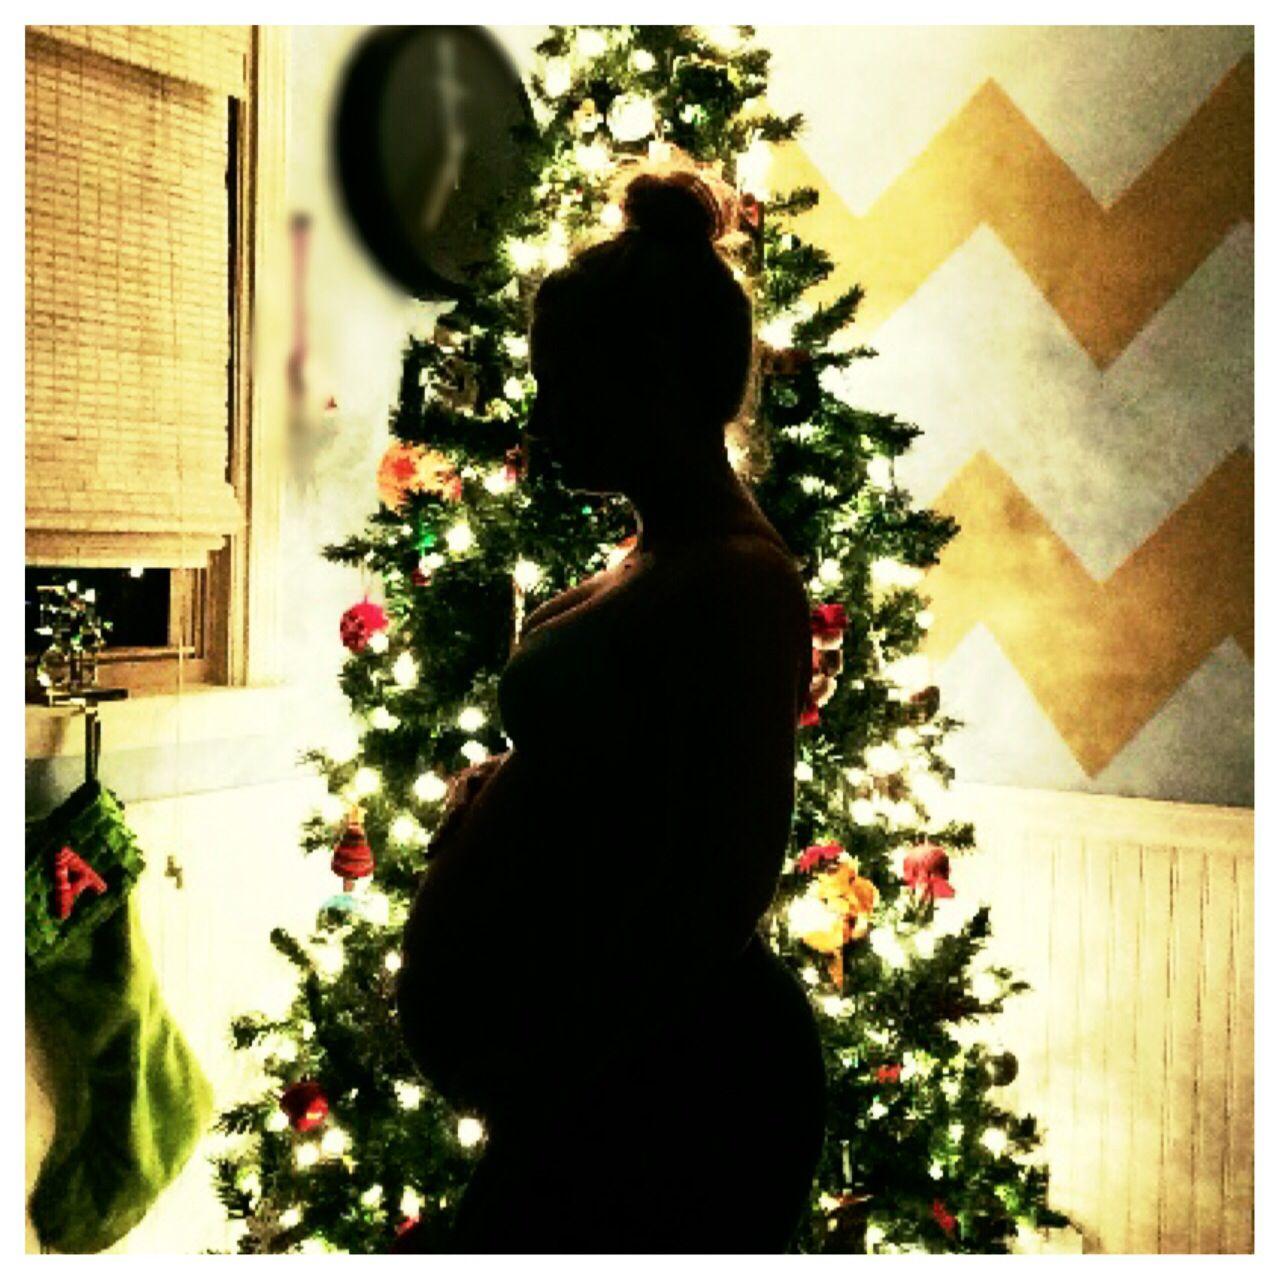 Maternity Christmas Pic Slim down with Sara 33 weeks / third pregnacy